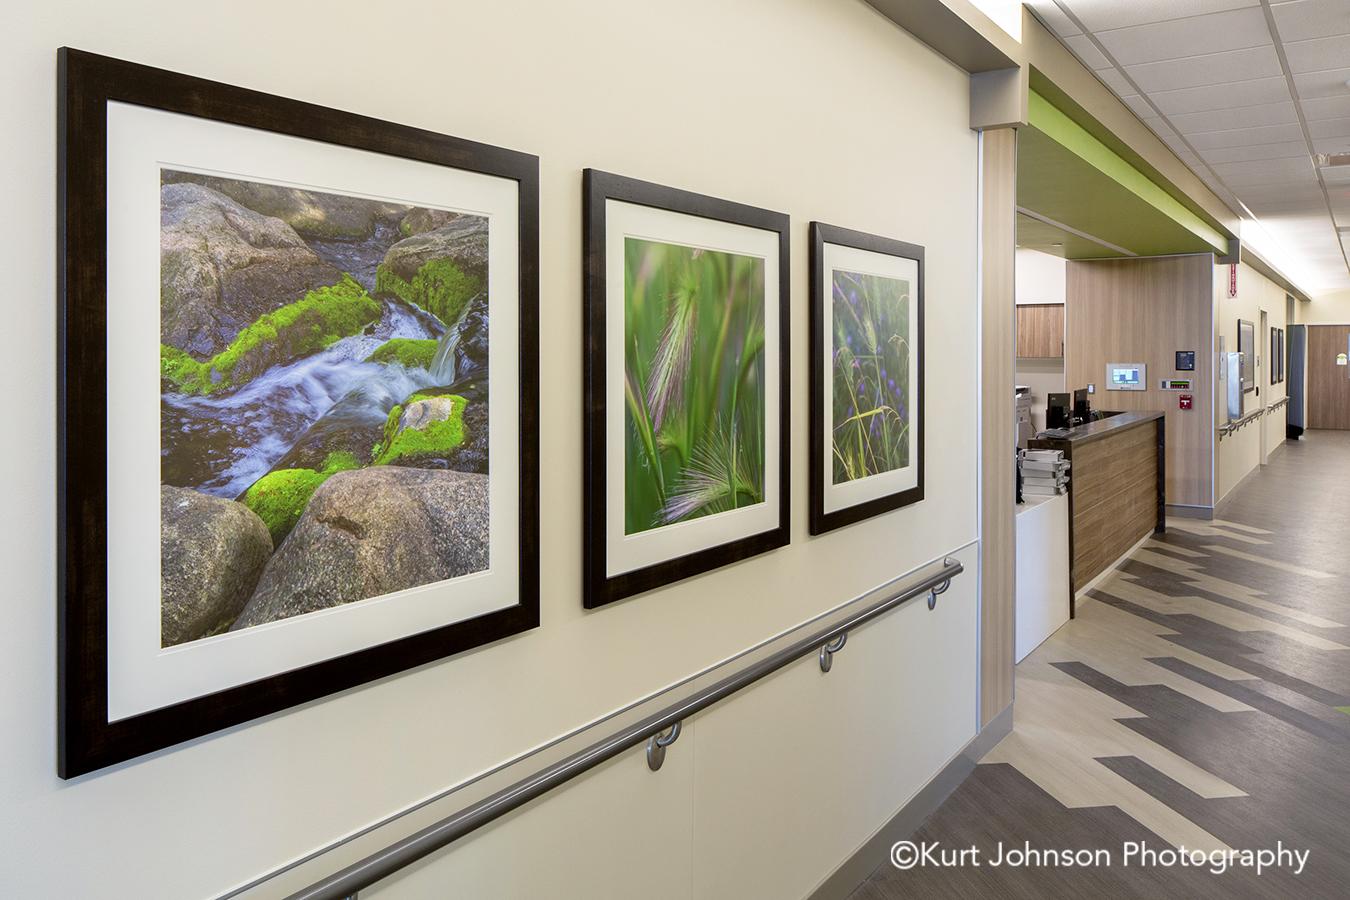 Regional Health Medical Center Advanced Orthopedic and Sports Medicine Institute Rapid City South Dakota framed healthcare art water green grass install installation hallway corridor